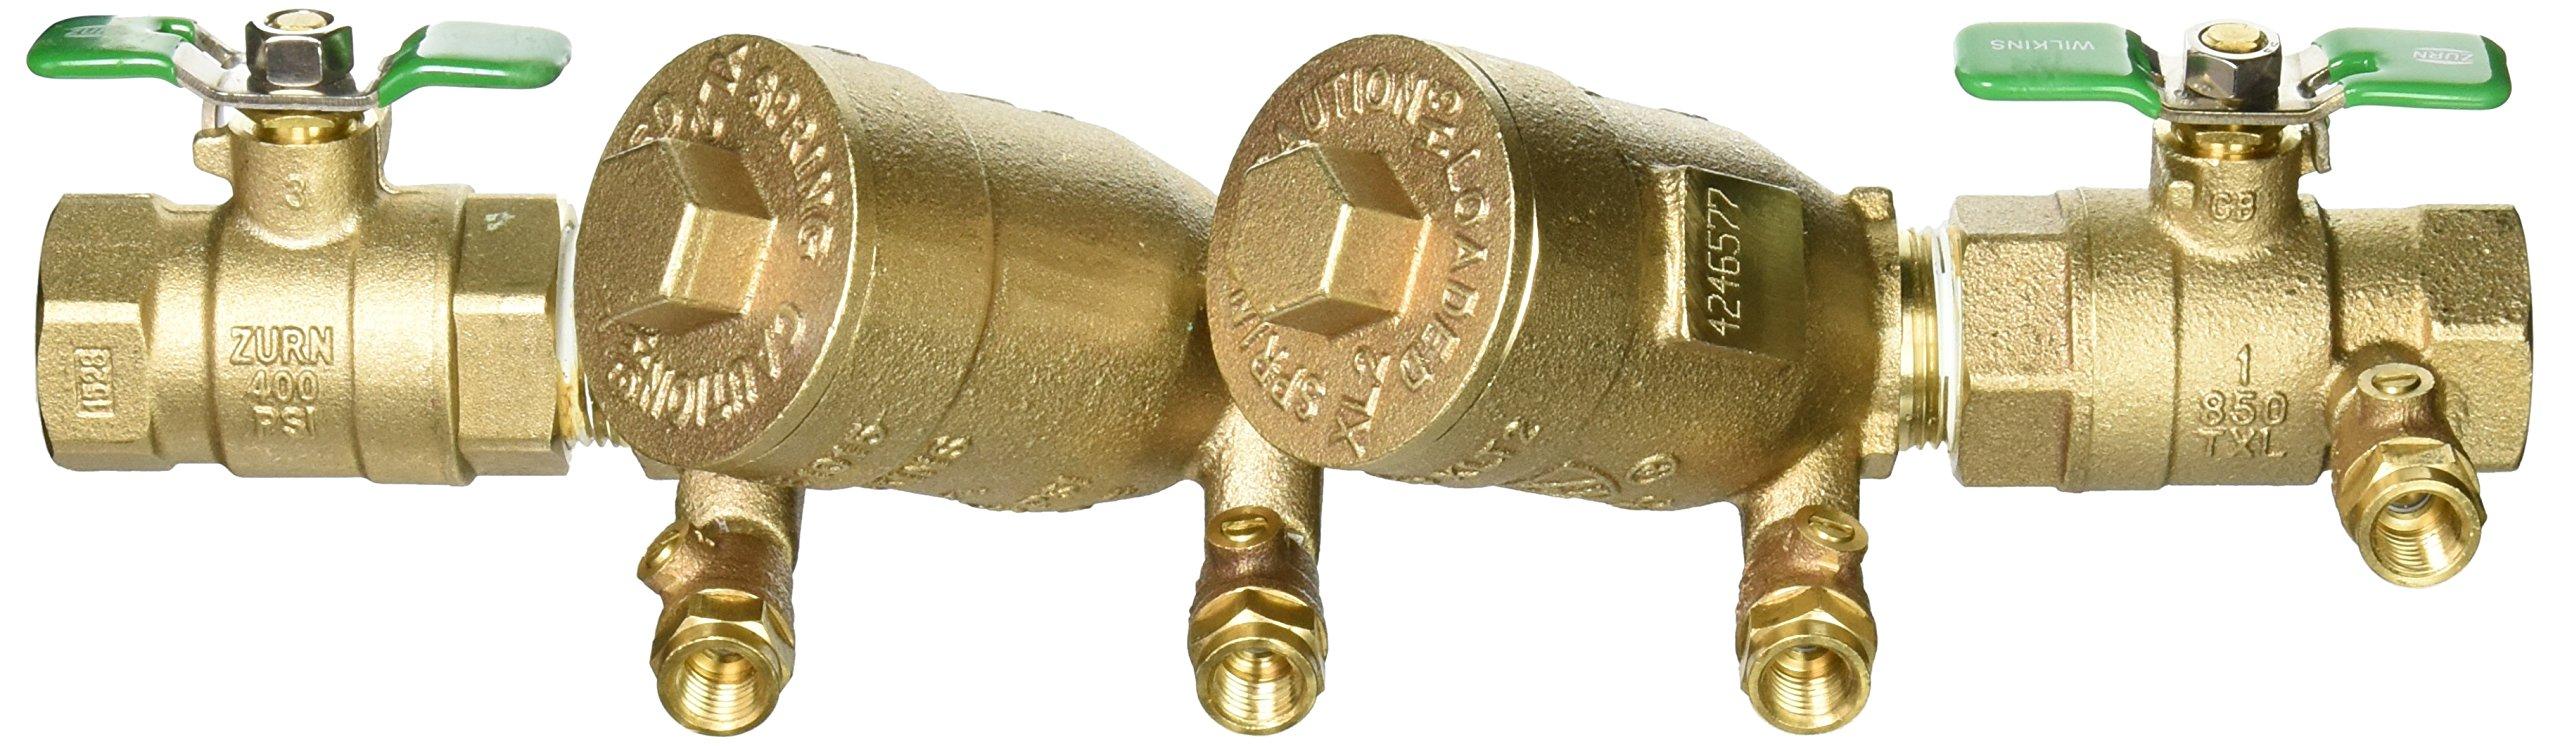 Zurn 1-950XLT2 Wilkins Double Check Valve Backflow Preventer 1'' Lead Free by Zurn (Image #9)